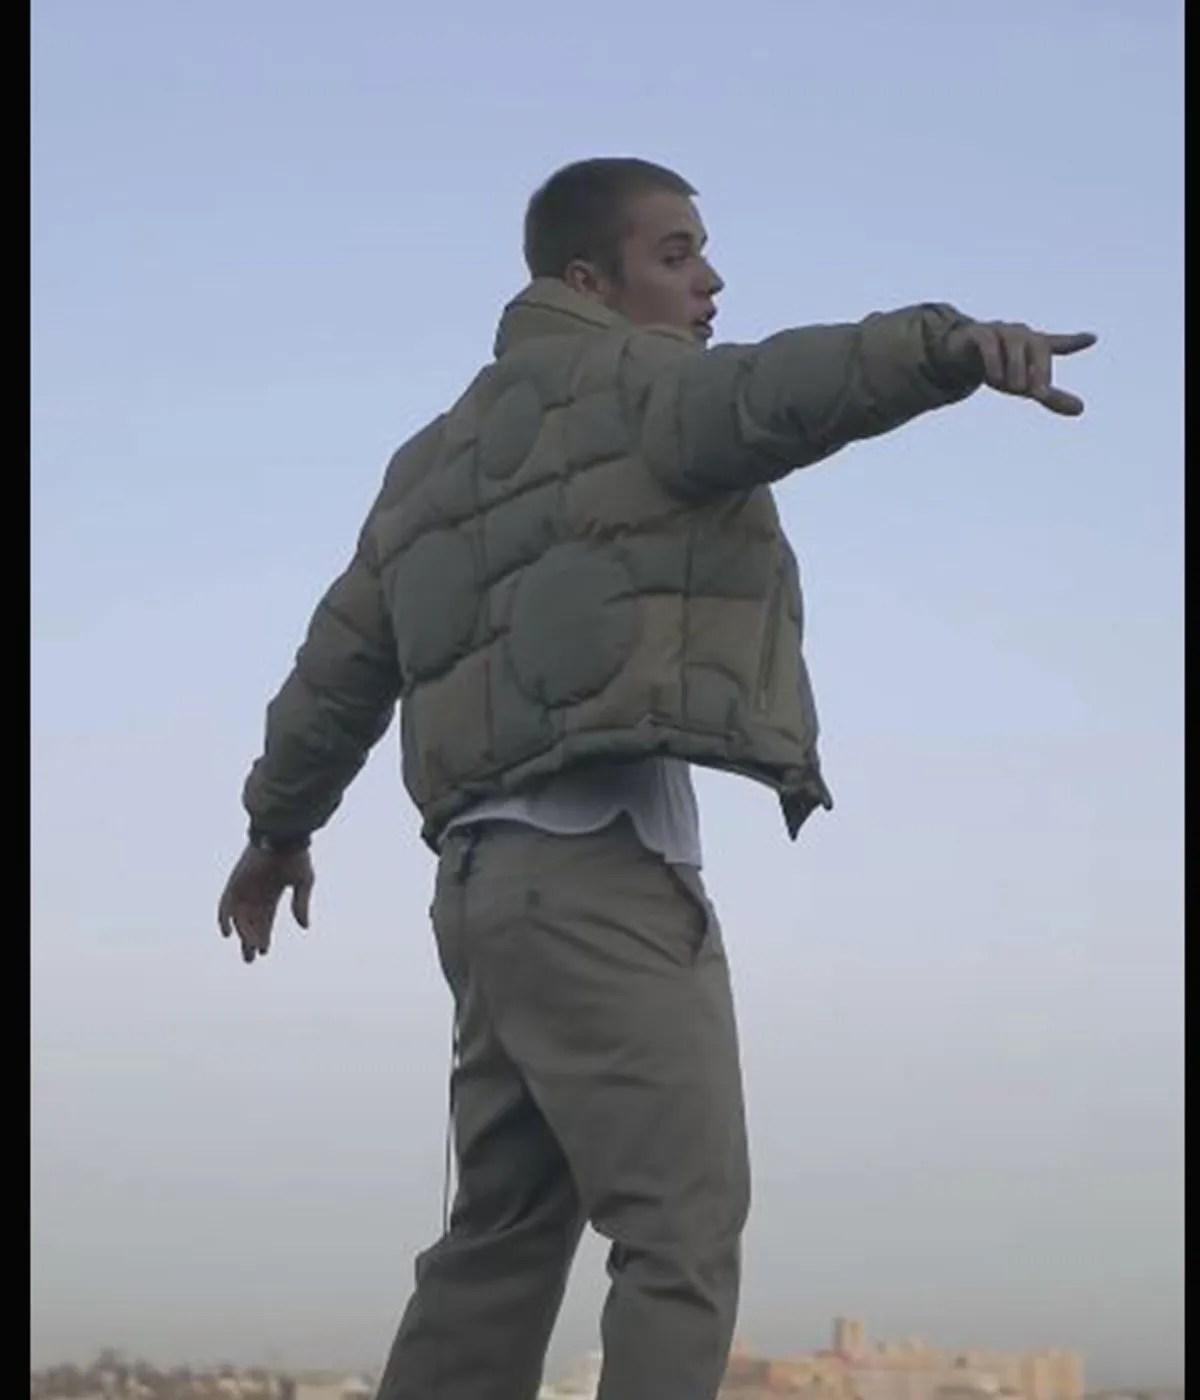 justin-bieber-stay-grey-jacket